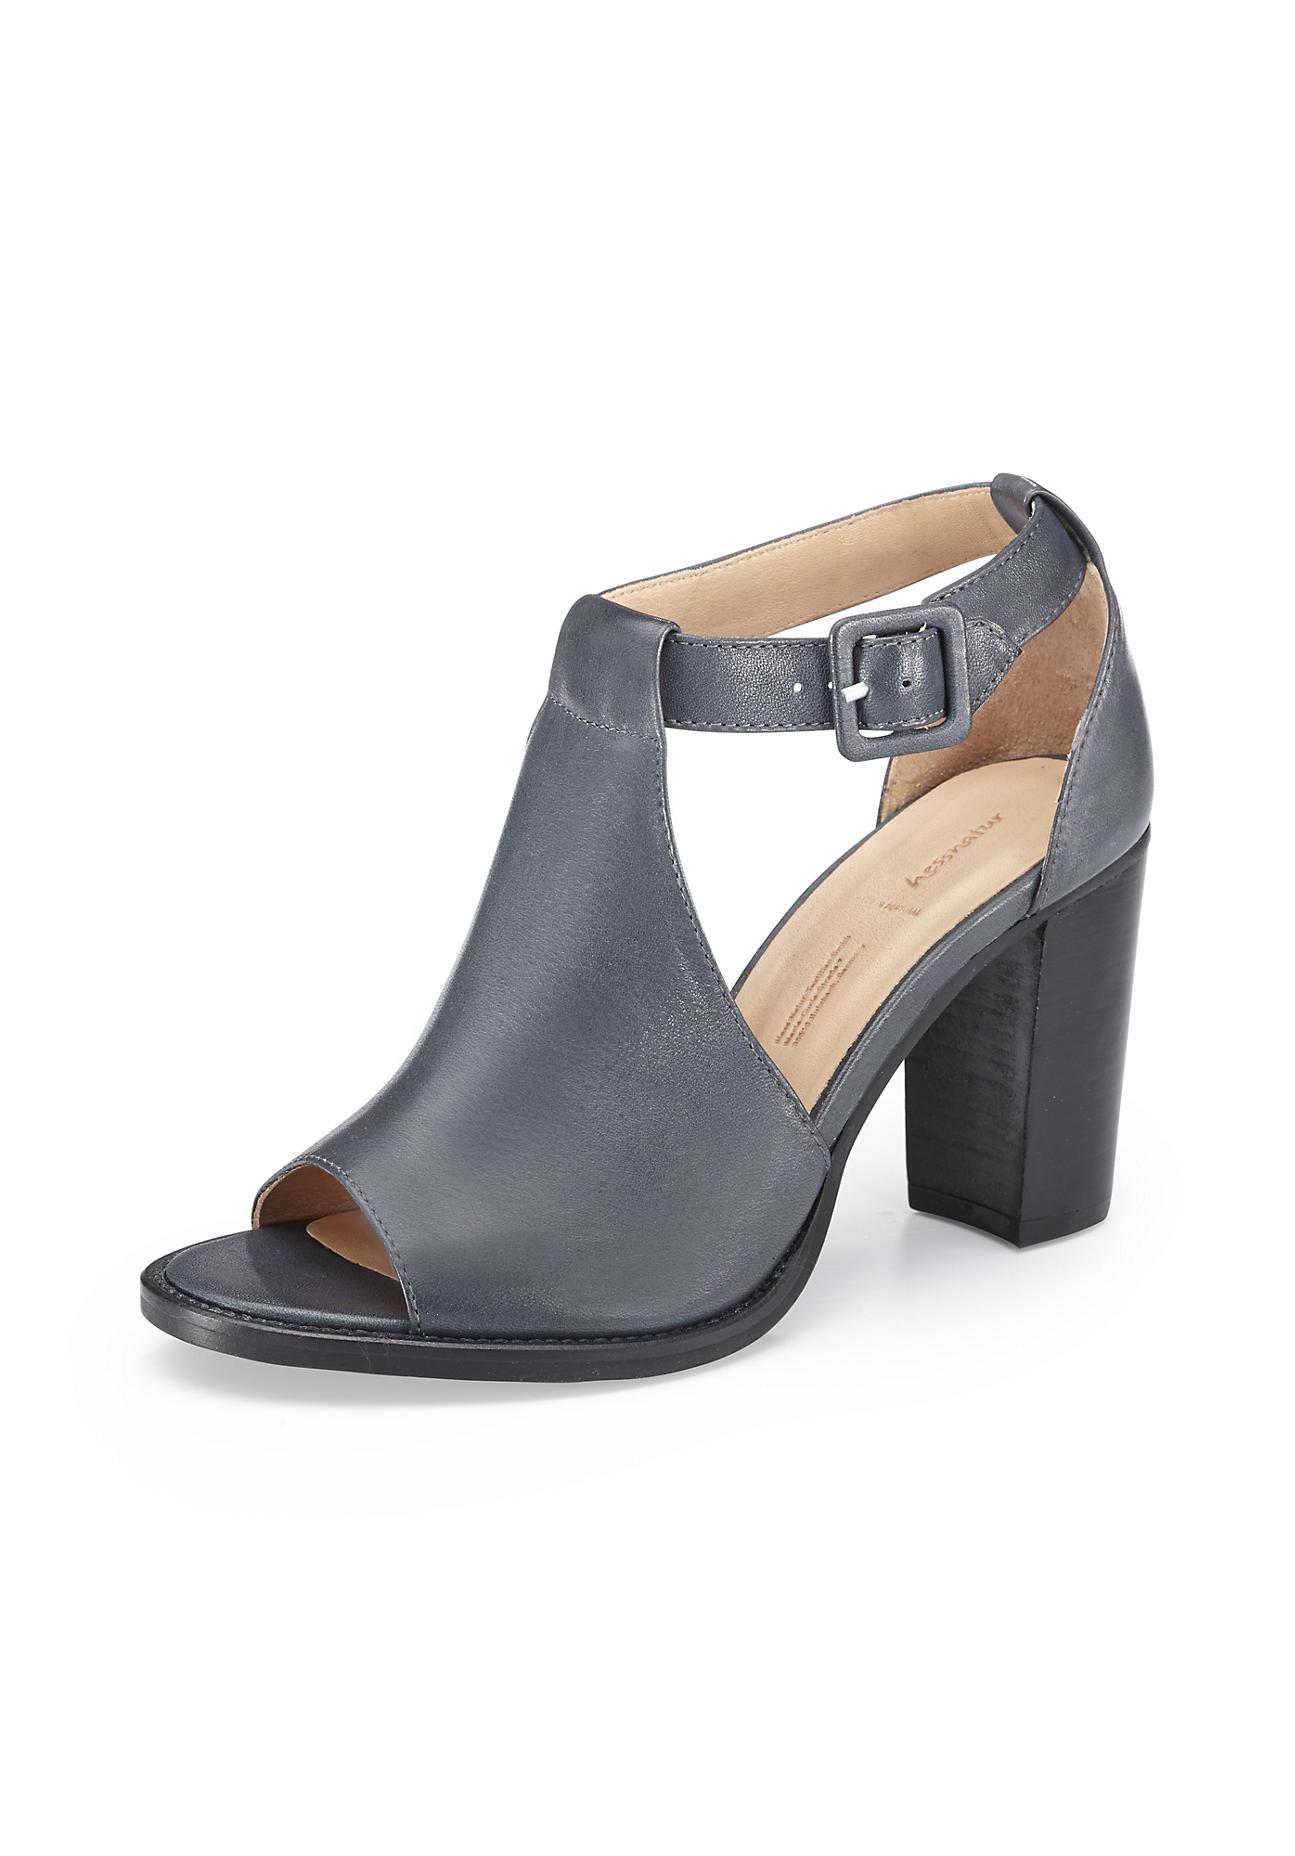 hessnatur Damen Damen Sandalette aus Leder – blau – Größe 37